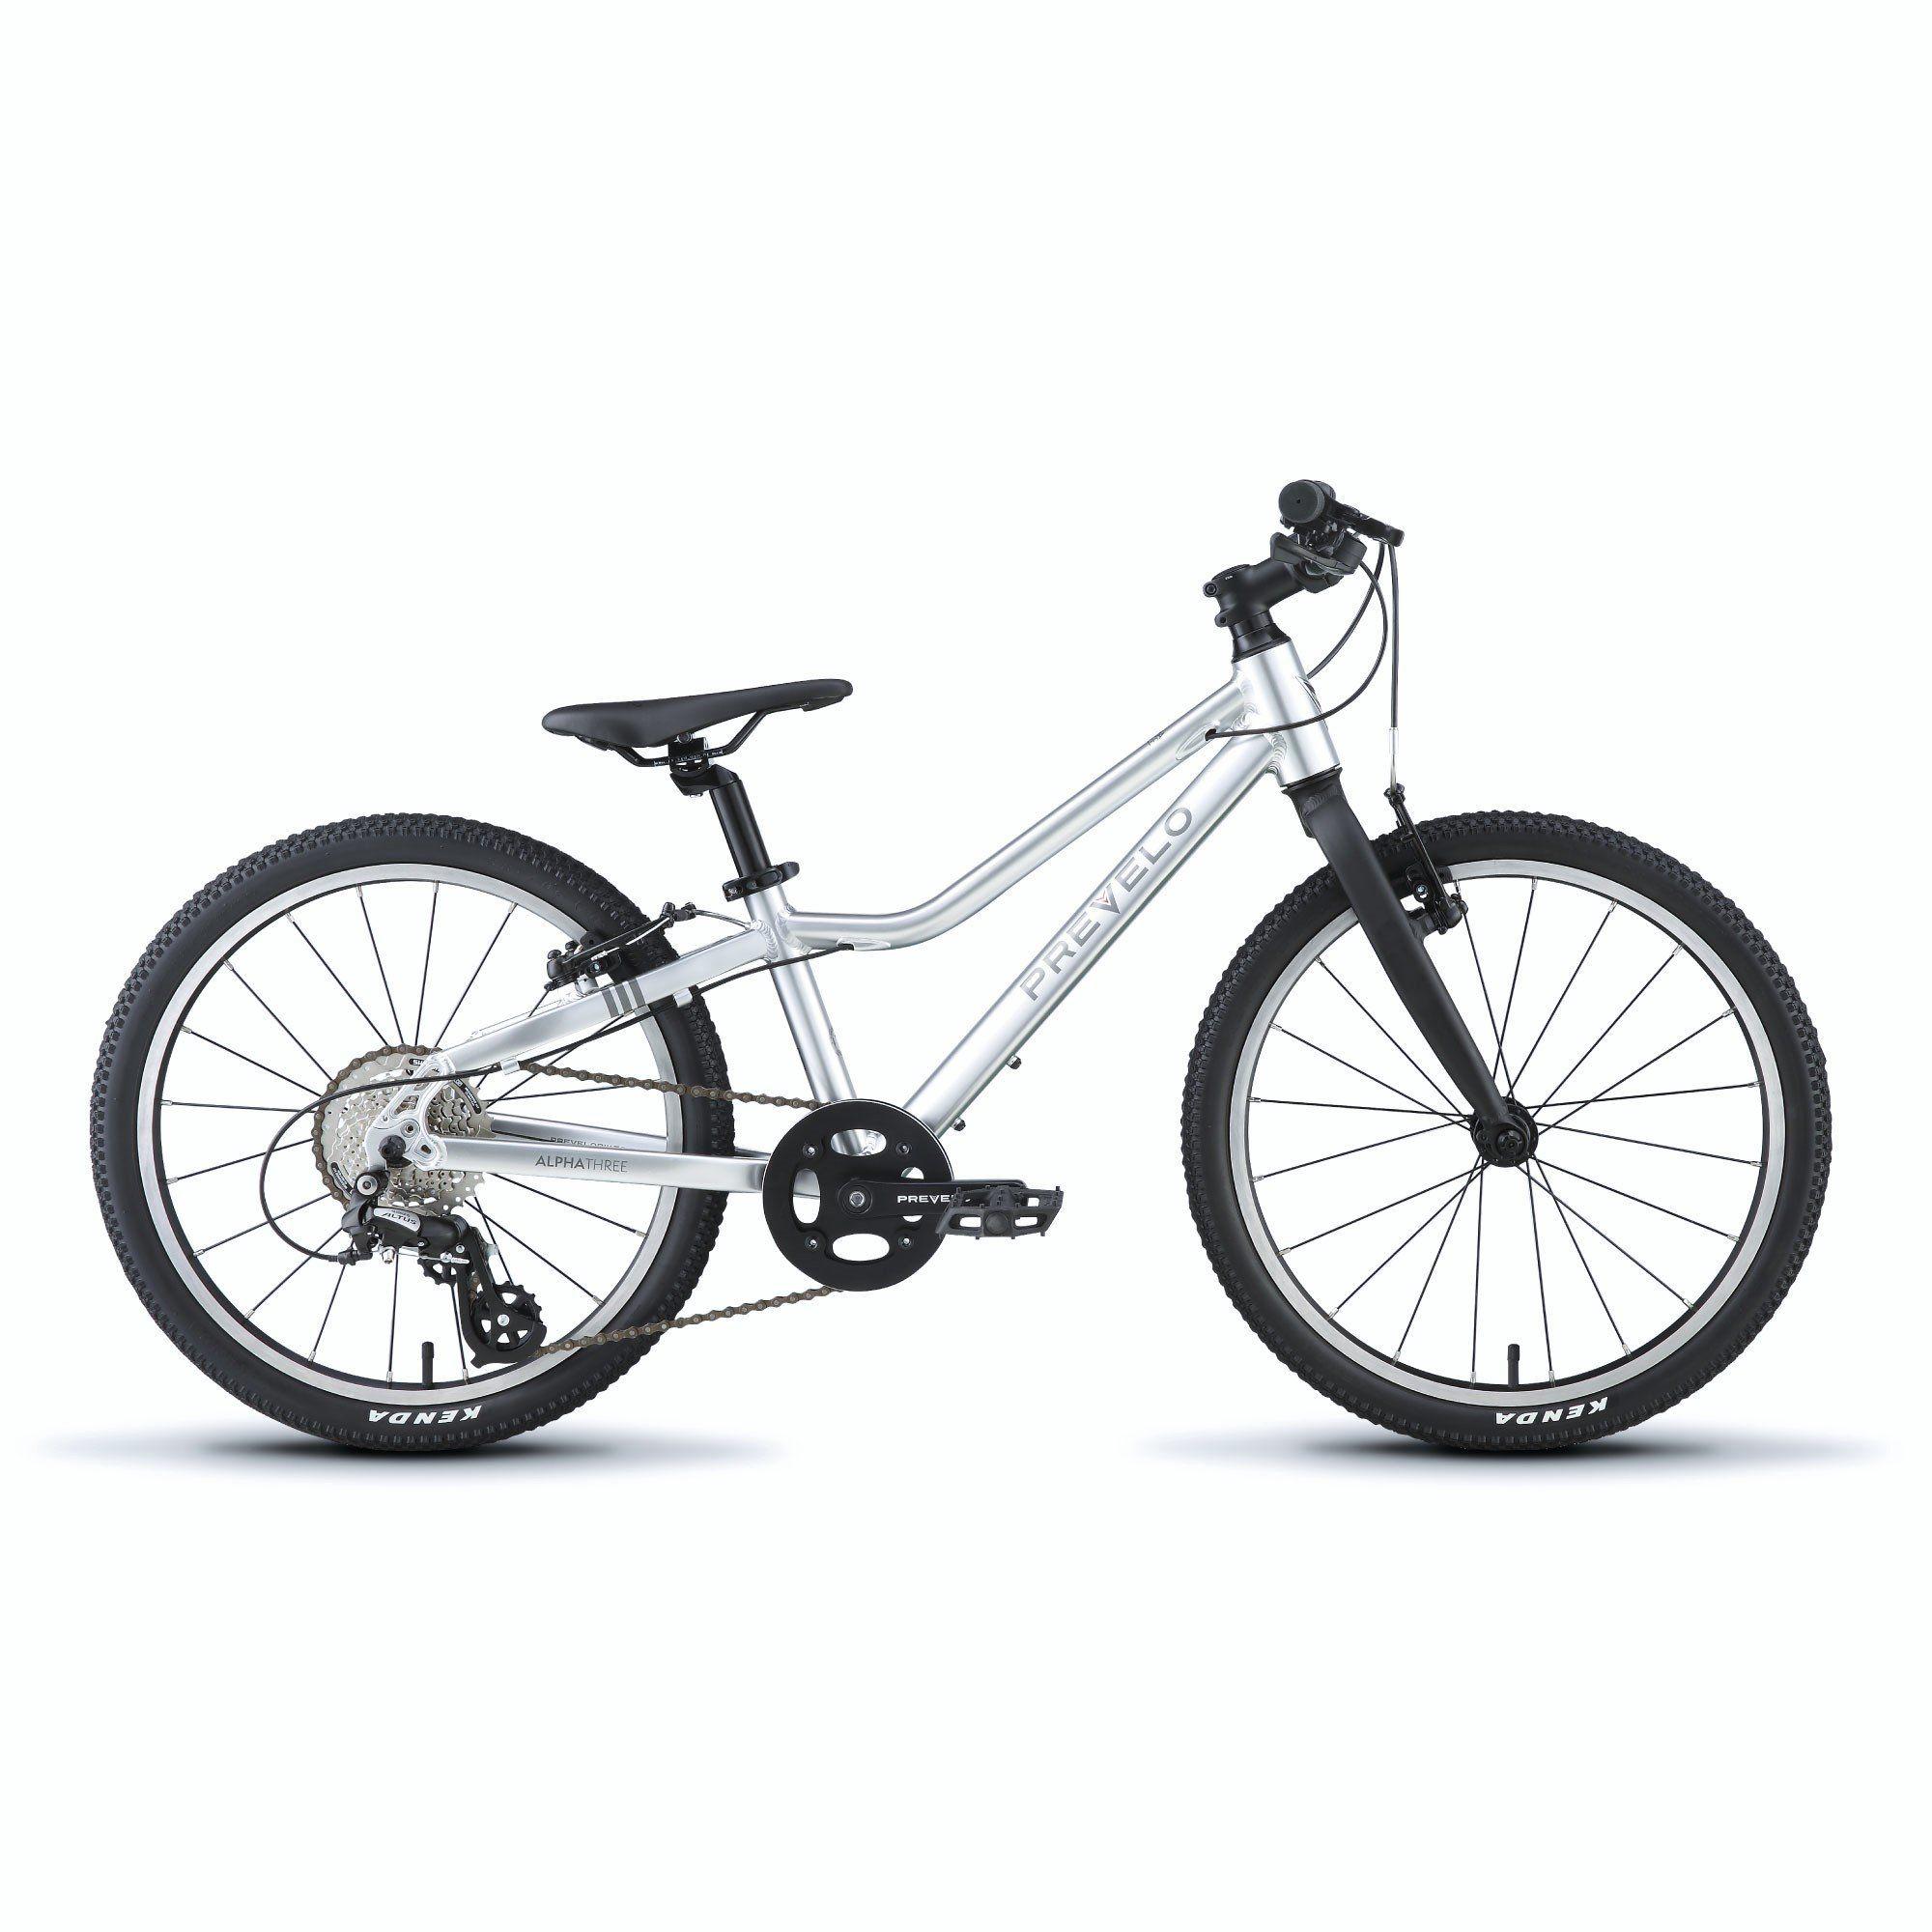 Best Top Unisex Bike Best Bike For 5 Year Old Bike